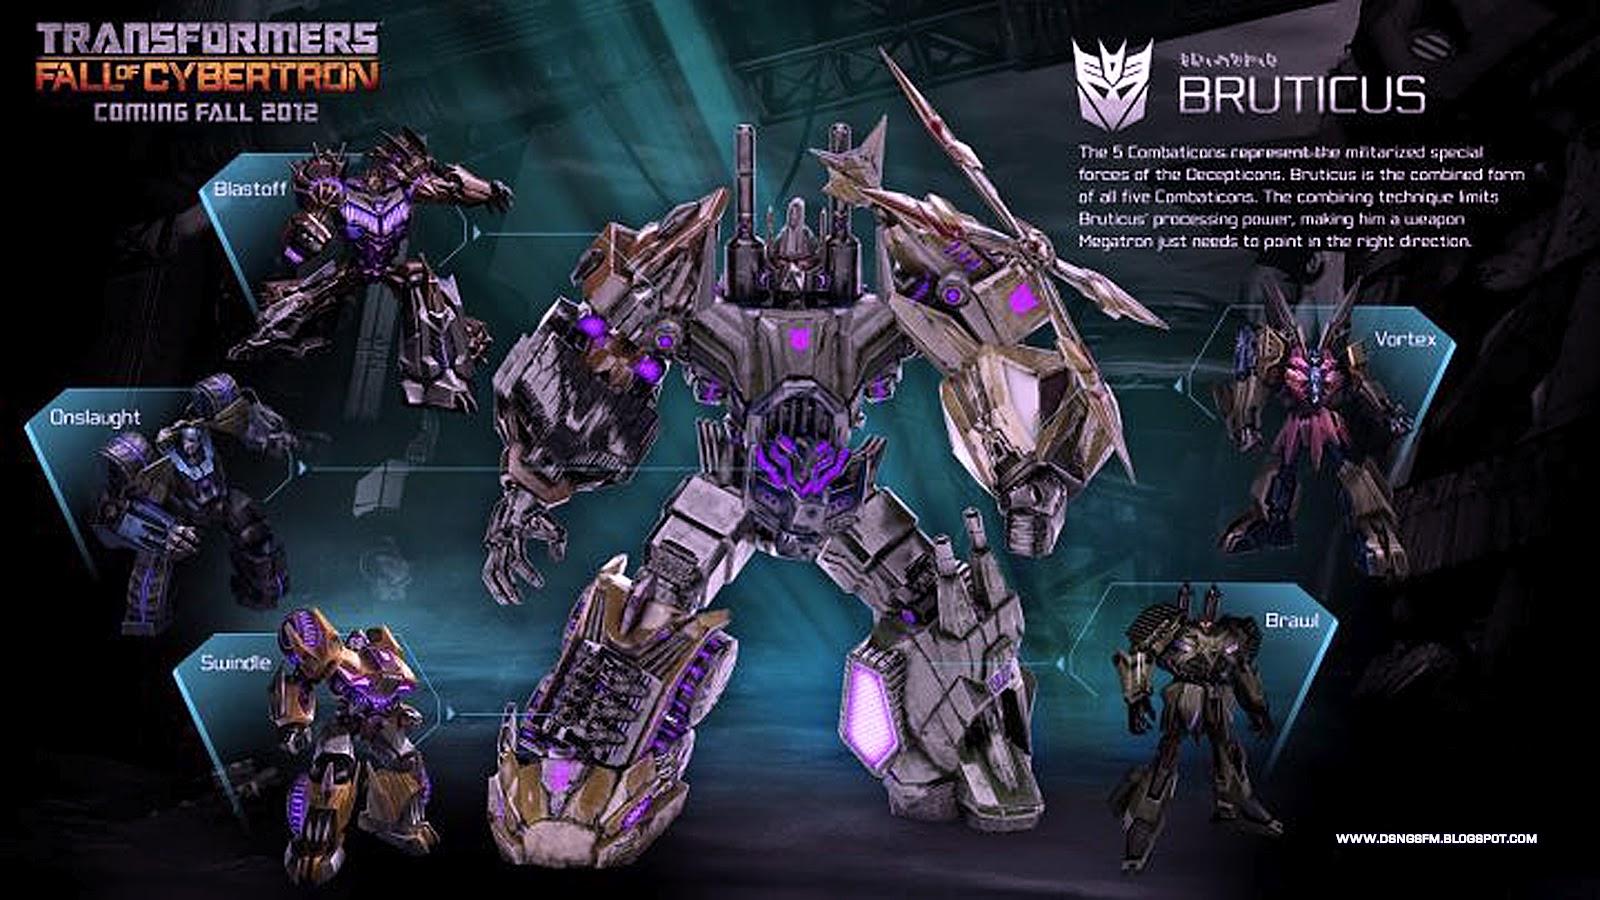 Transformers Fall Of Cybertron Wallpaper Dsng S Sci Fi Megaverse Transformers Fall Of Cybertron